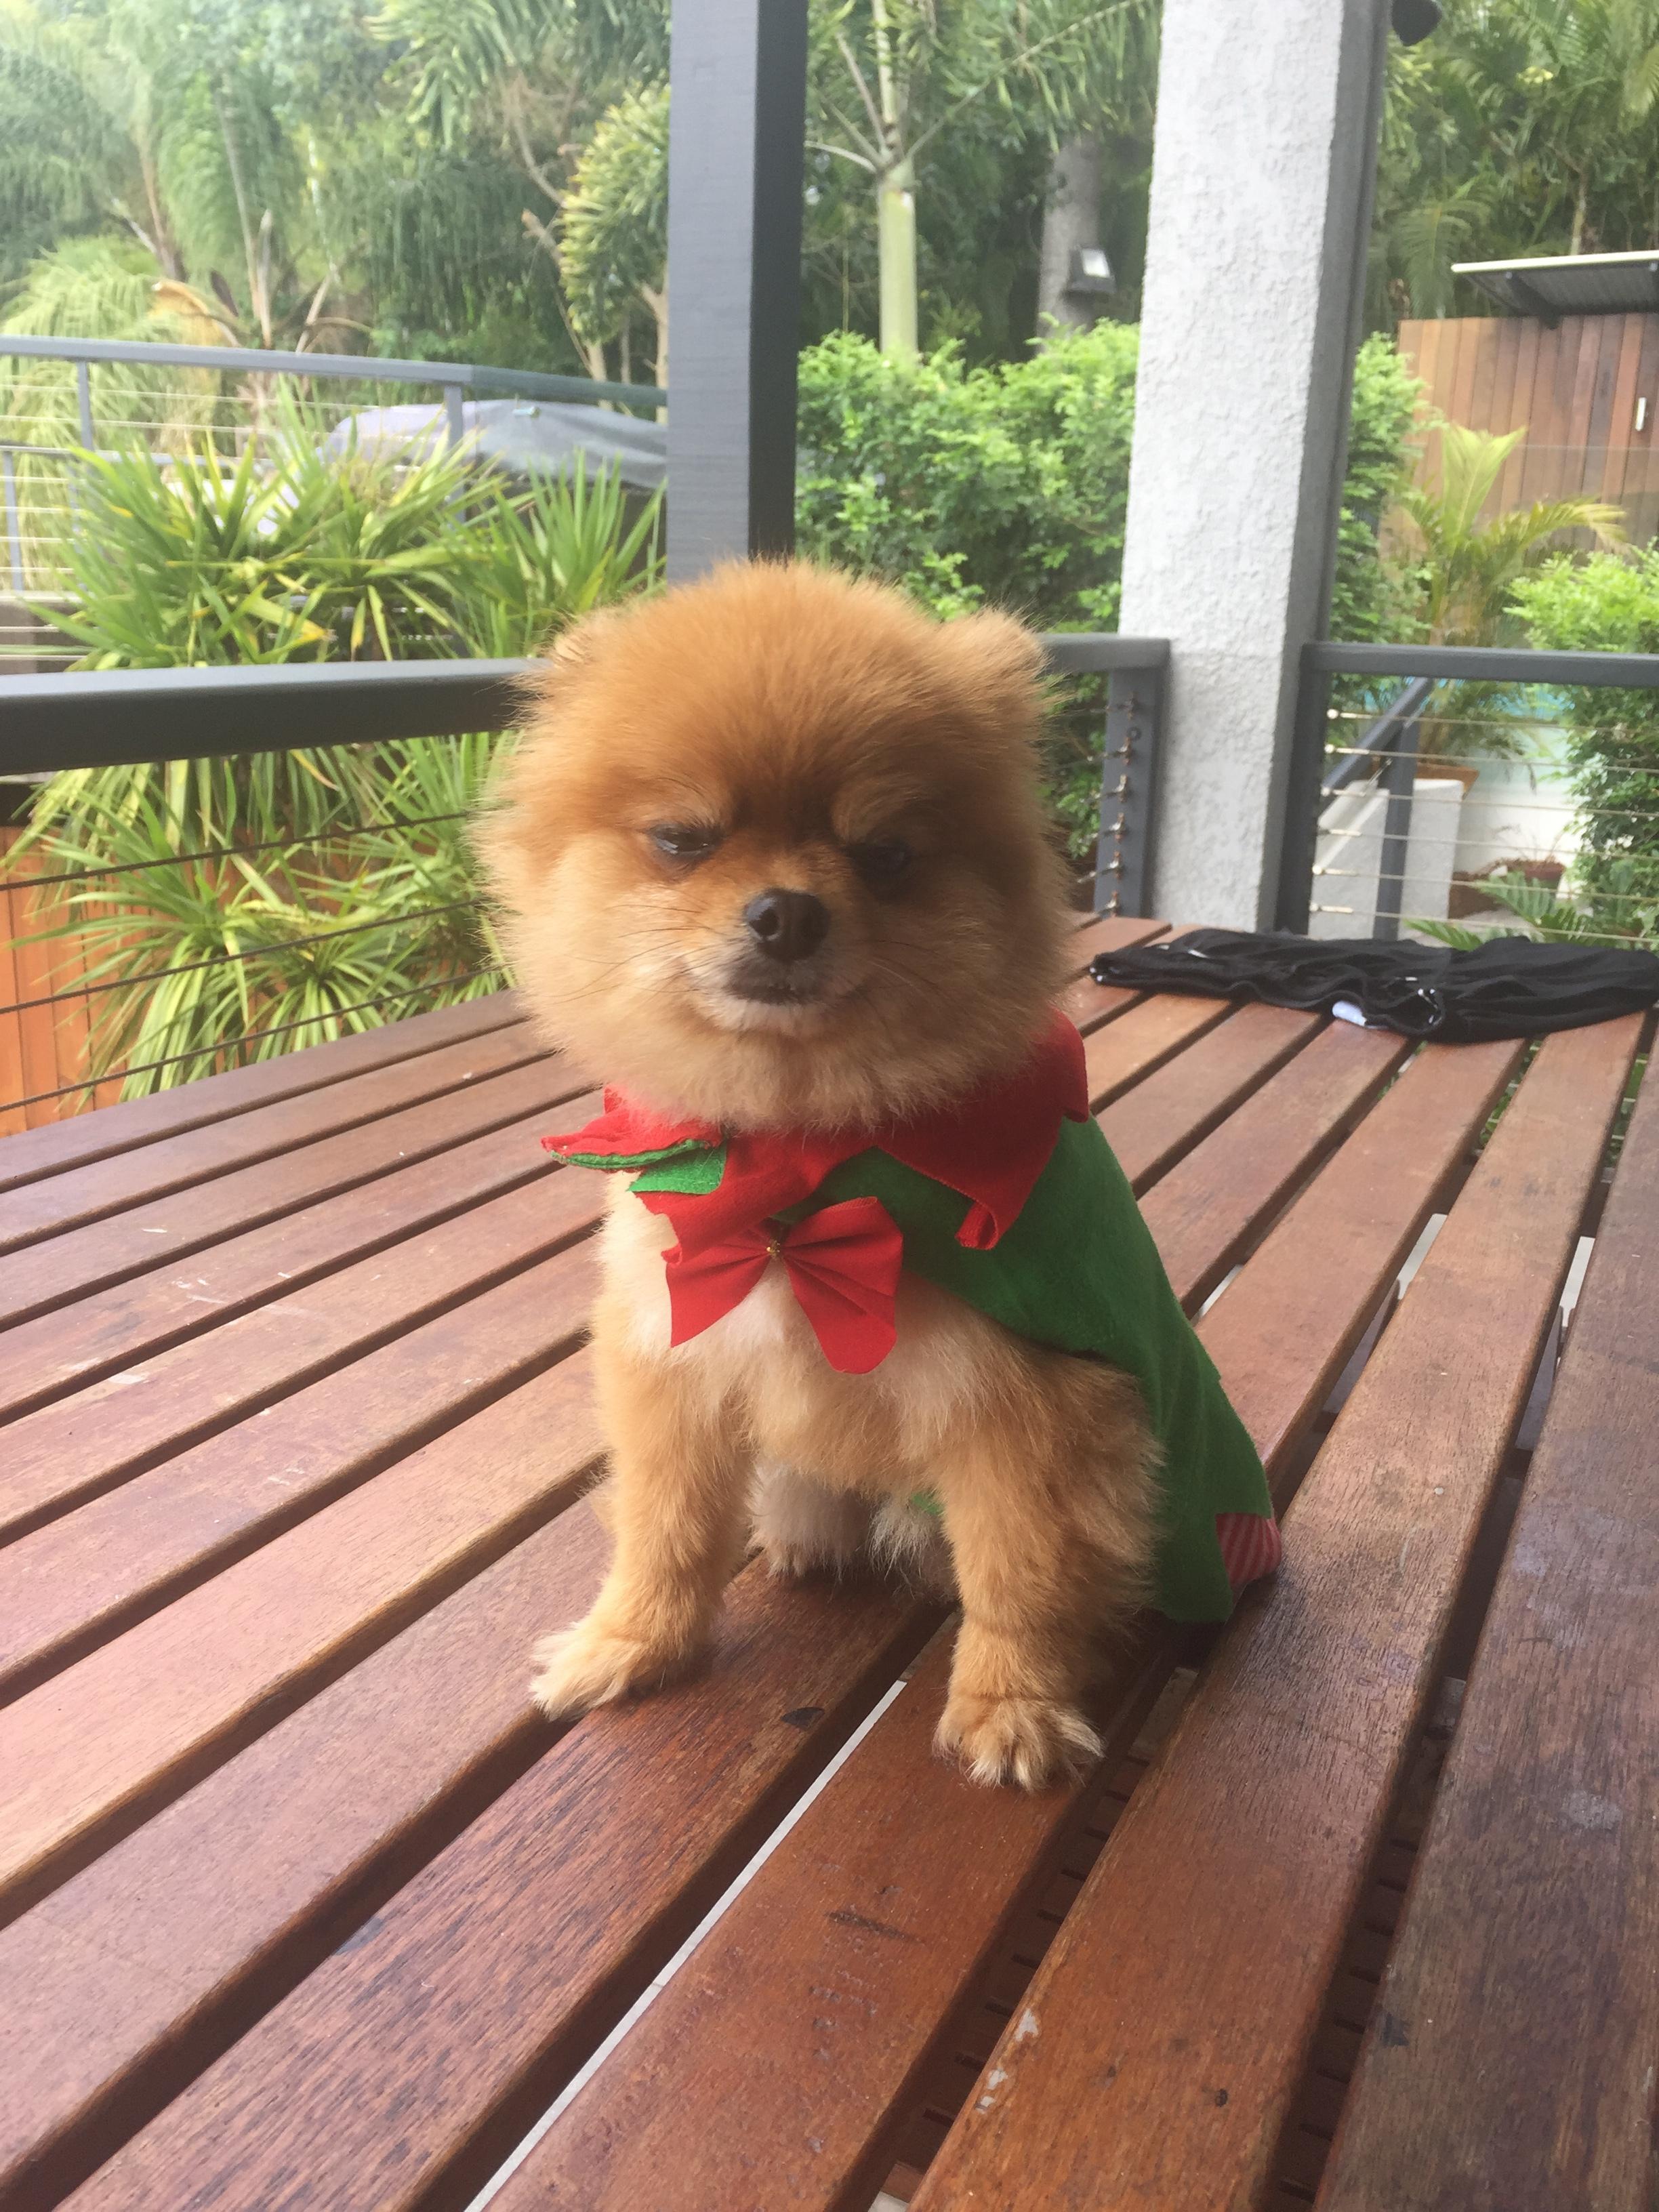 Teddy the grumpy Christmas elf.